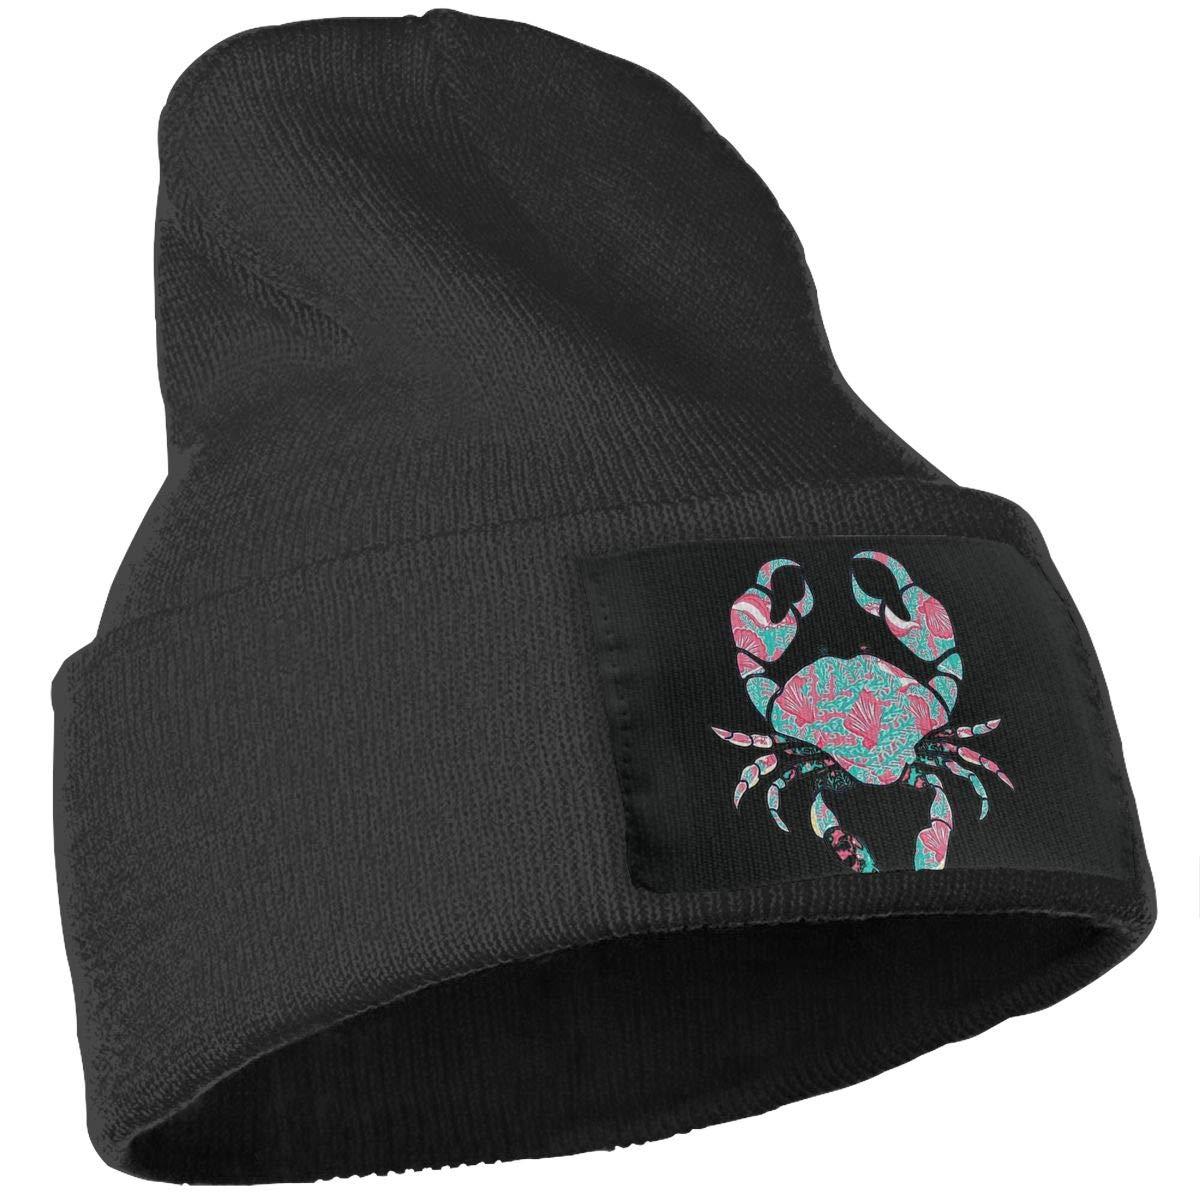 SLADDD1 Crab Warm Winter Hat Knit Beanie Skull Cap Cuff Beanie Hat Winter Hats for Men /& Women